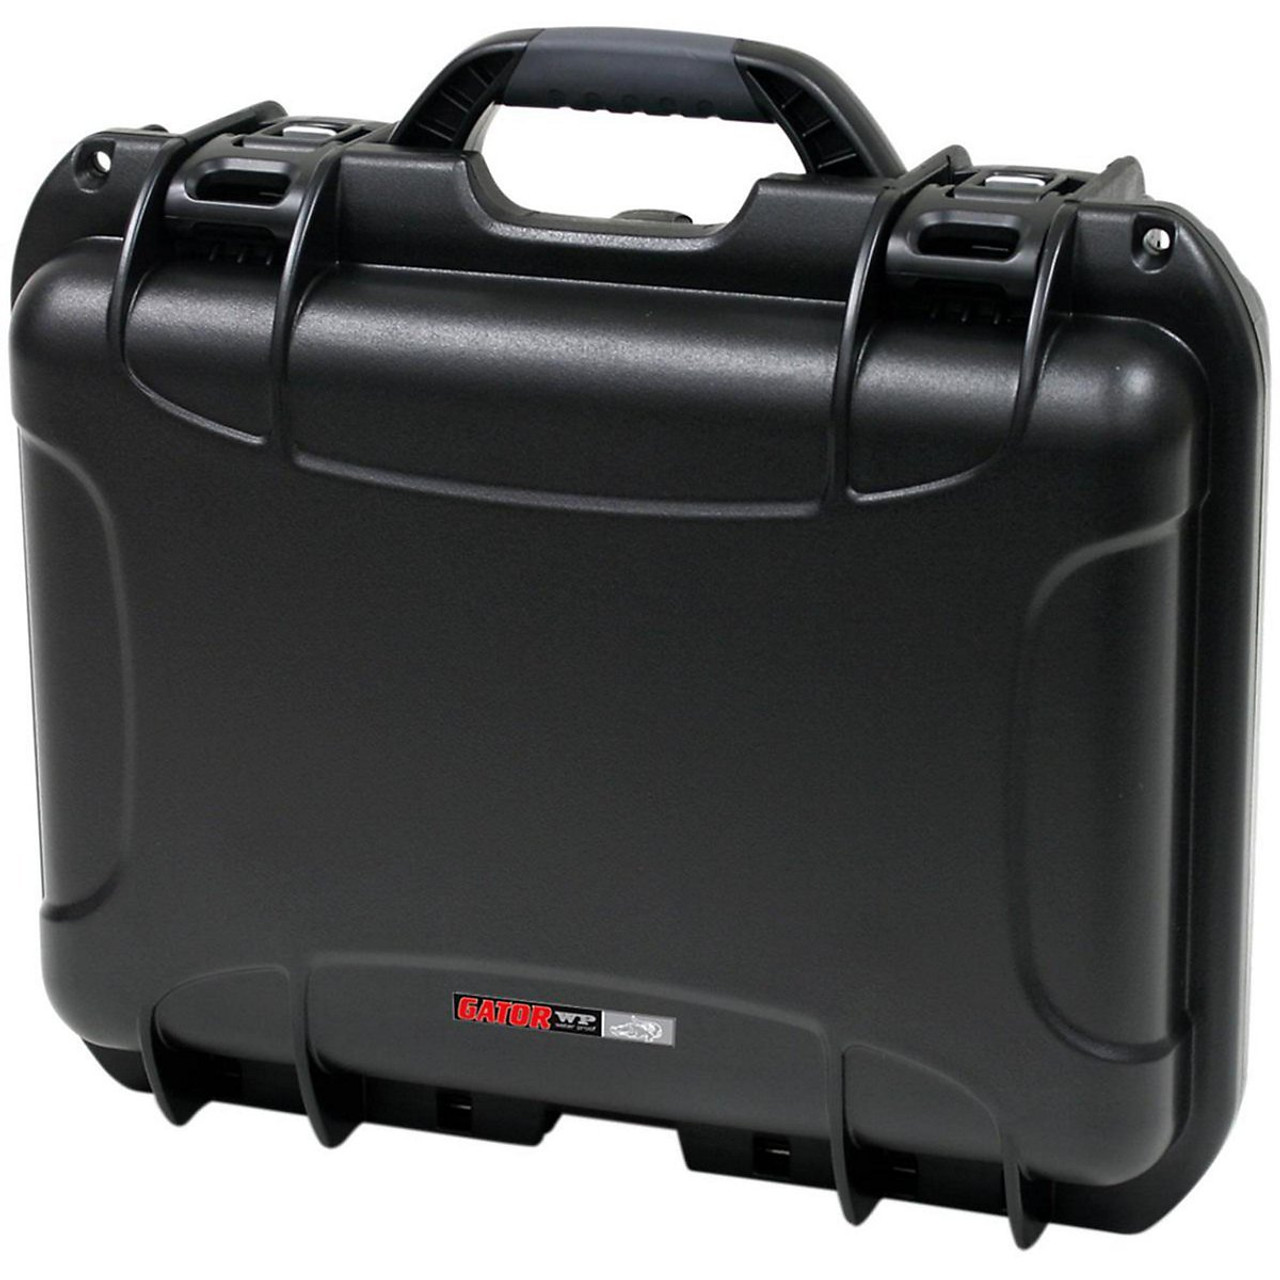 "Gator Cases GU-1510-06-WPDV Titan Series Waterproof Equipment with Divider Insert 15"" x 10.5"" x 6.2"""